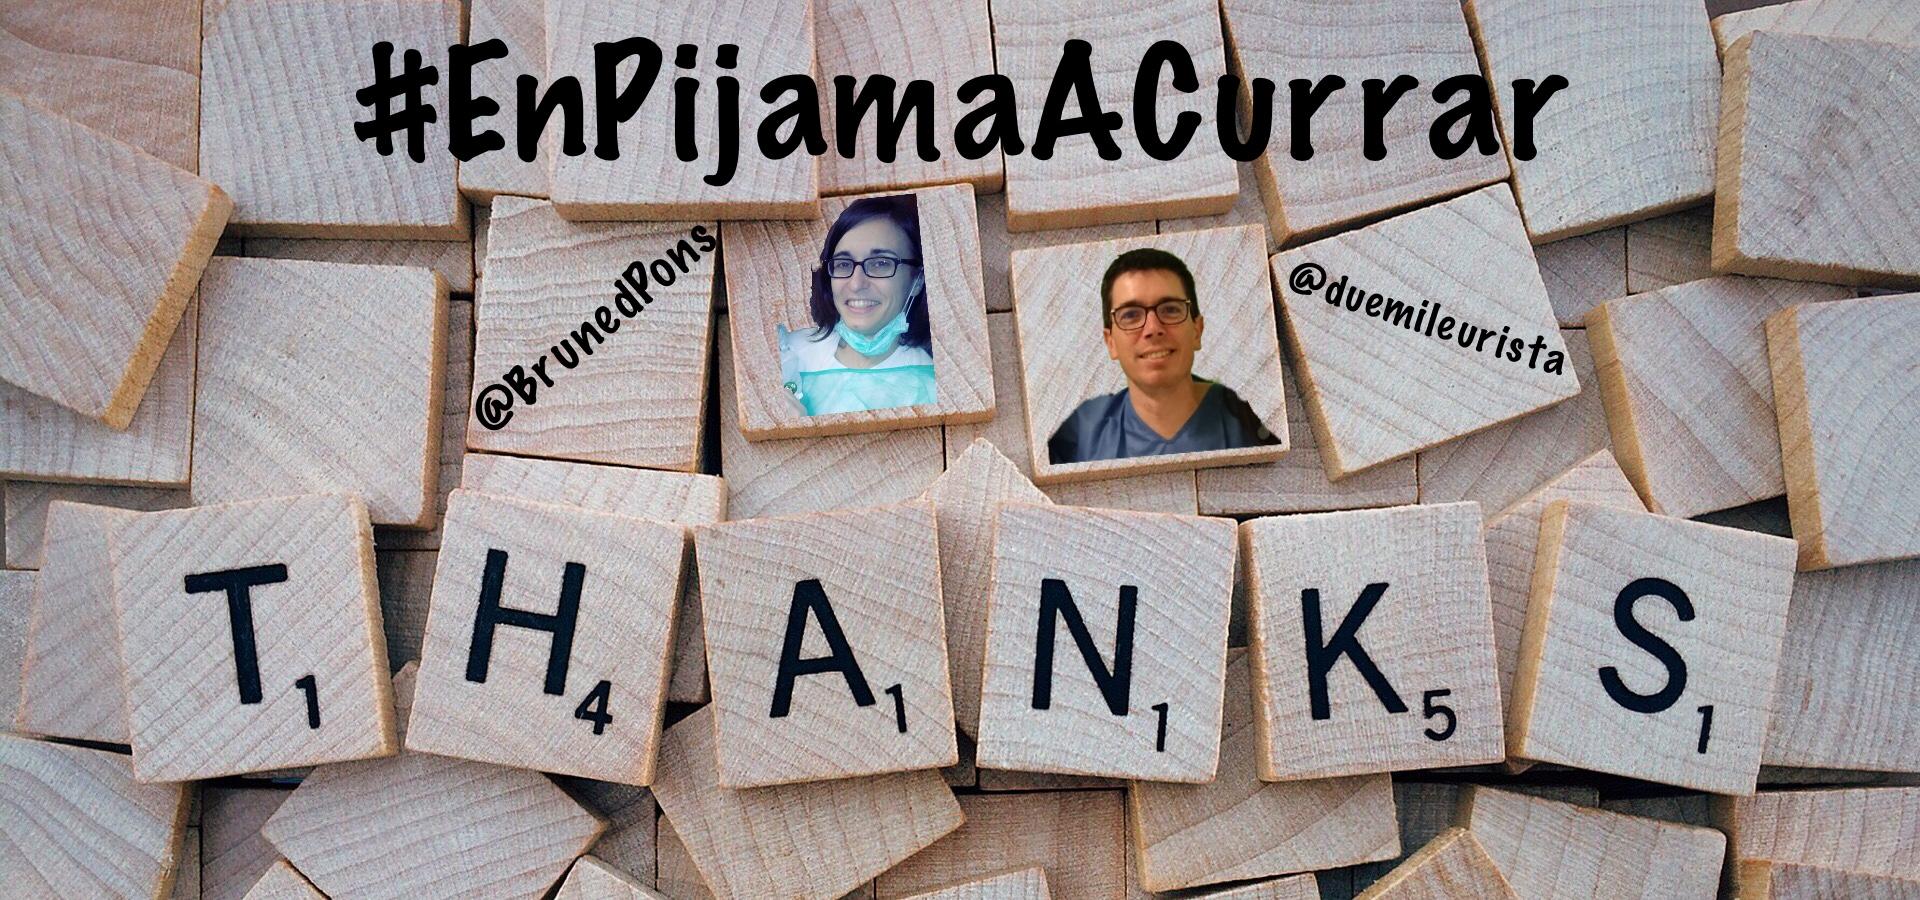 #EnPijamaACurrar Gracias